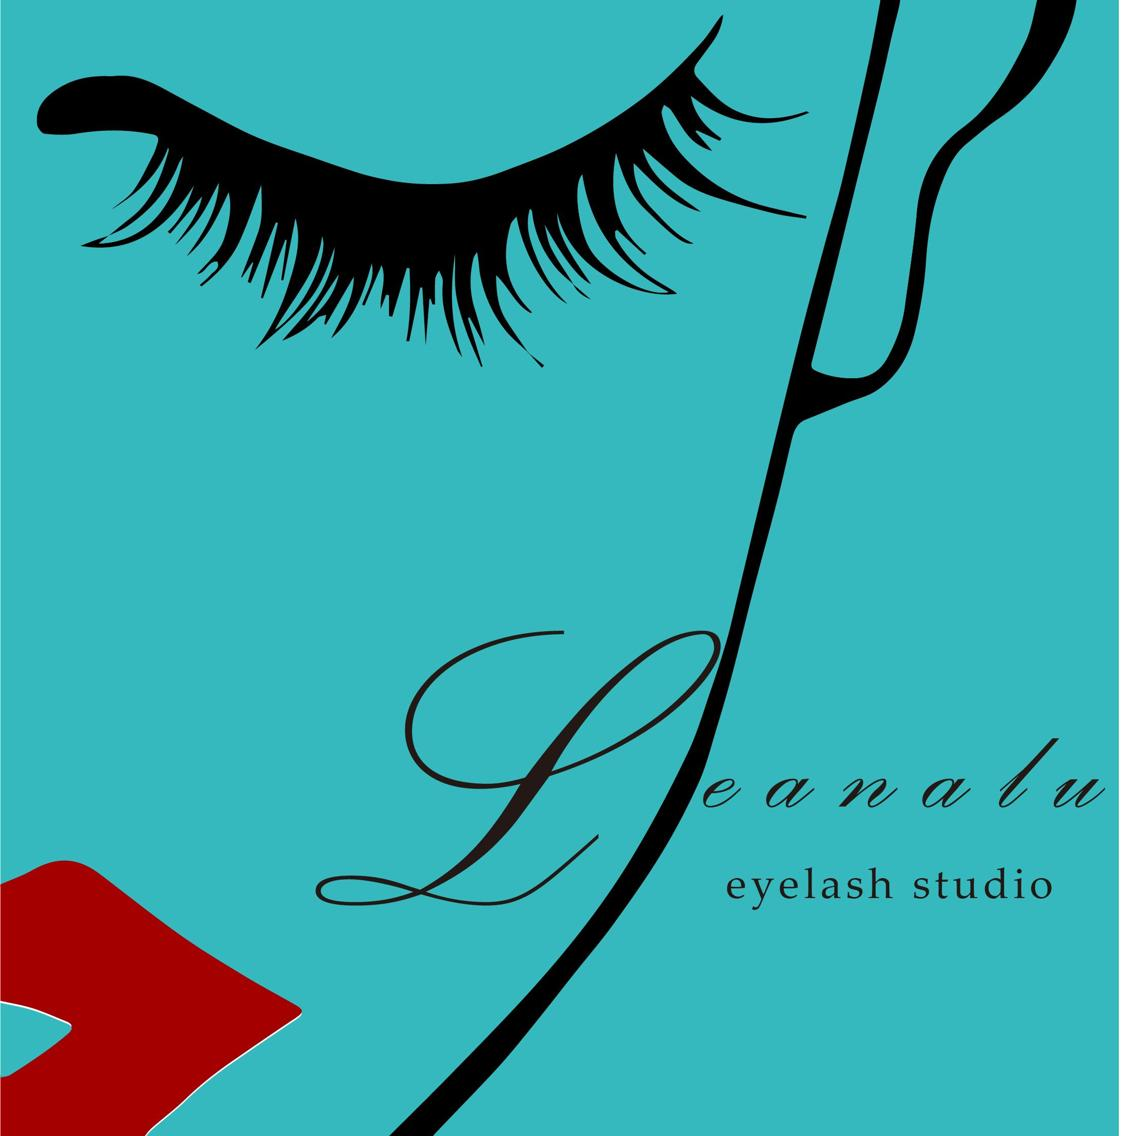 eyelash Leanalu 横浜店所属・eyelashLeanal横浜店の掲載